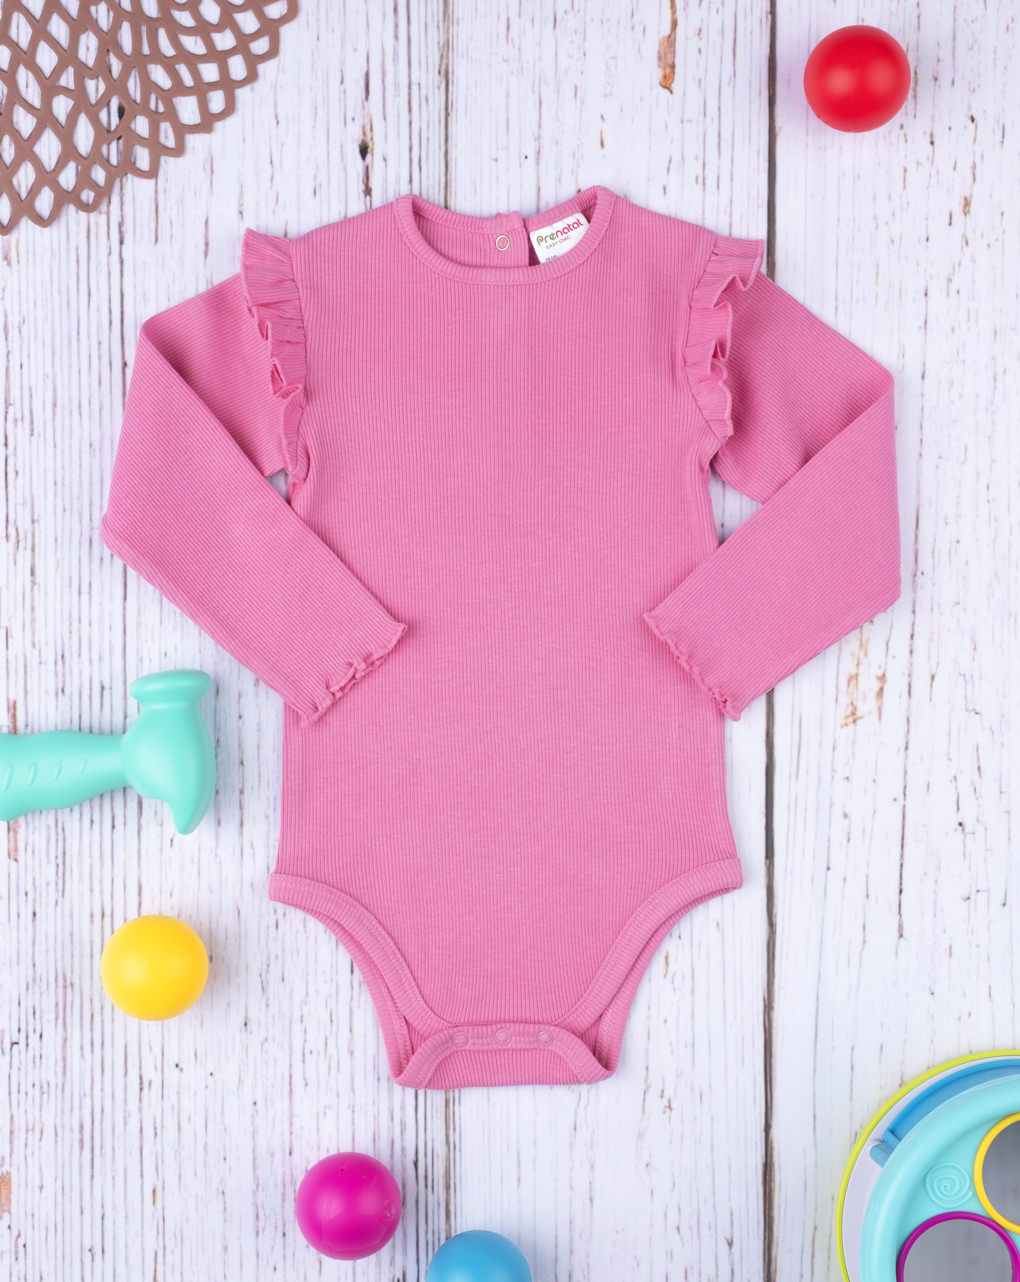 Body costina girl pink - Prénatal